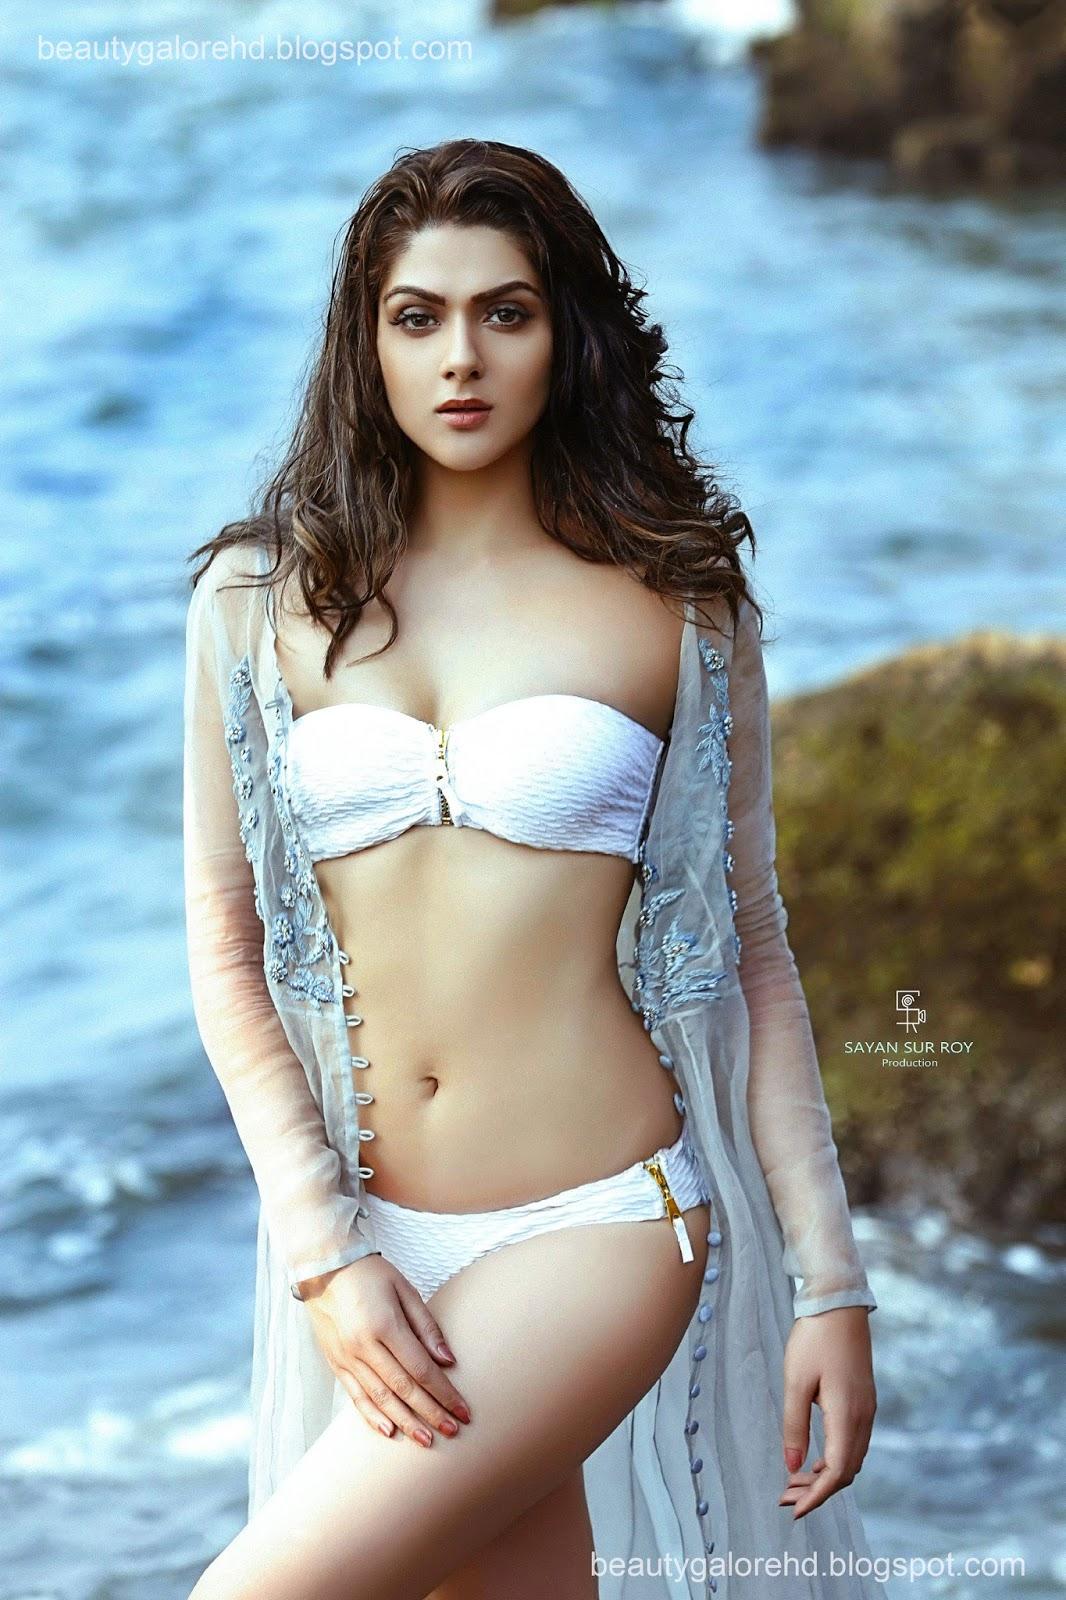 Beauty Galore Hd  Sakshi Chaudhary First Time Bikini -3894